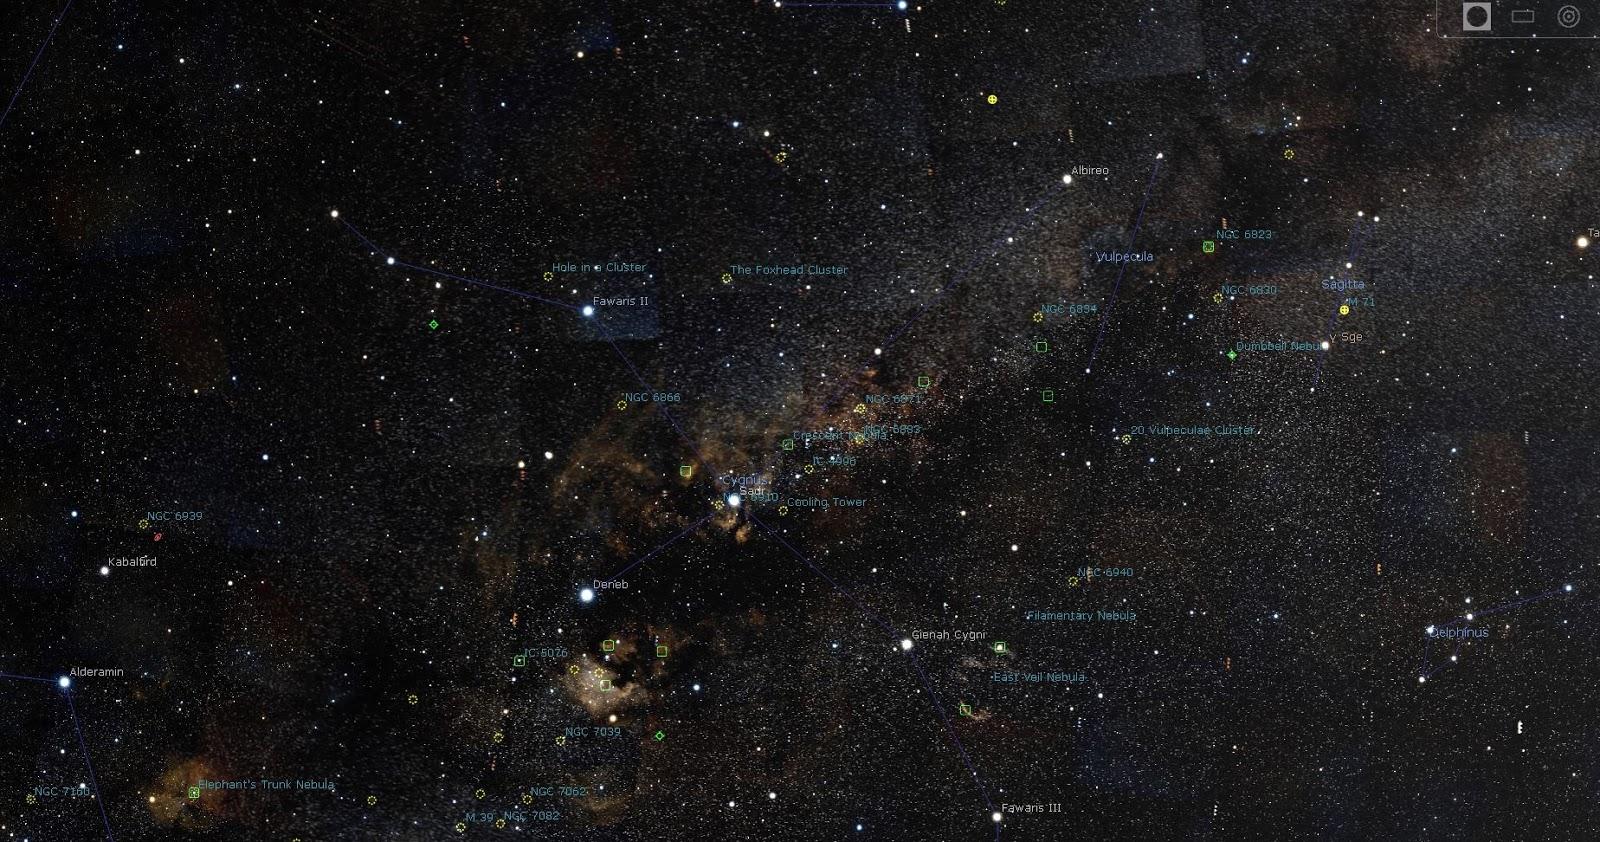 Uncle Rod's Astro Blog: Issue #527: The New Stellarium